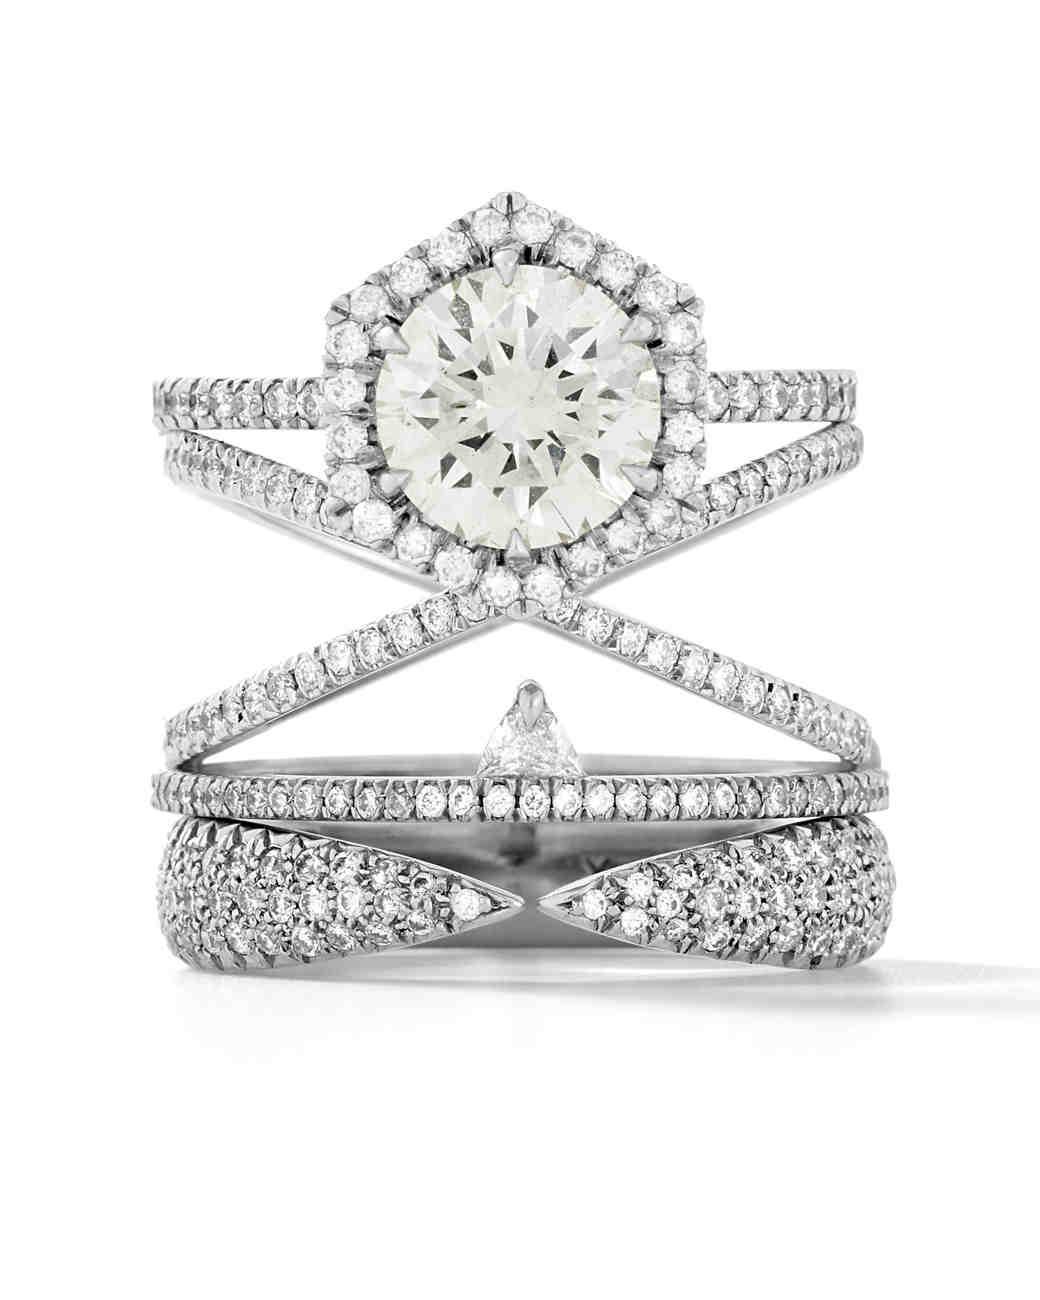 Eva Fehren Platinum Premier Stack with White Diamond Pavé